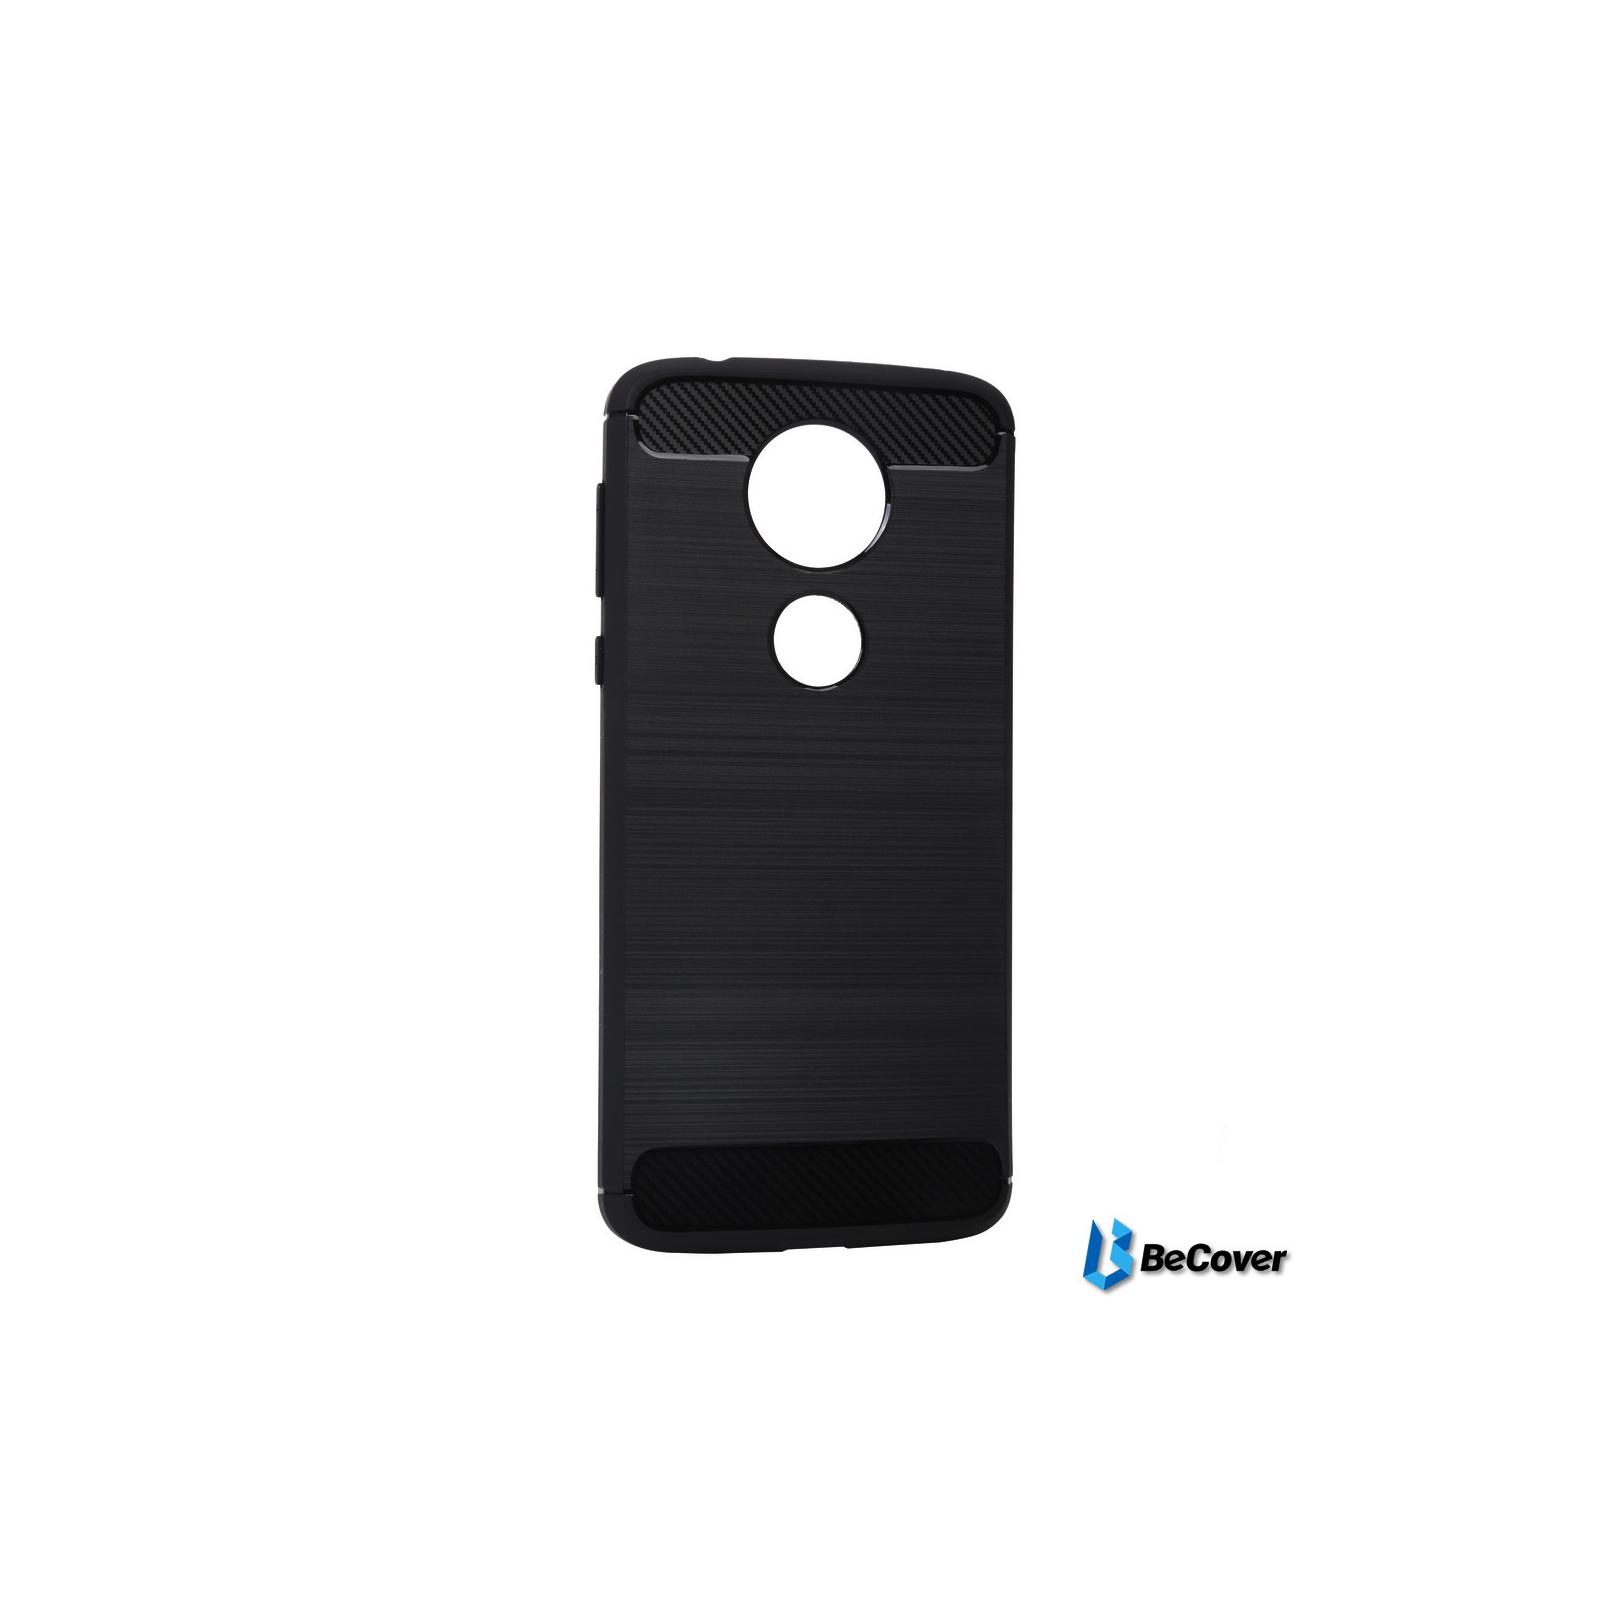 Чехол для моб. телефона BeCover для Motorola G7 Power Black (703968)